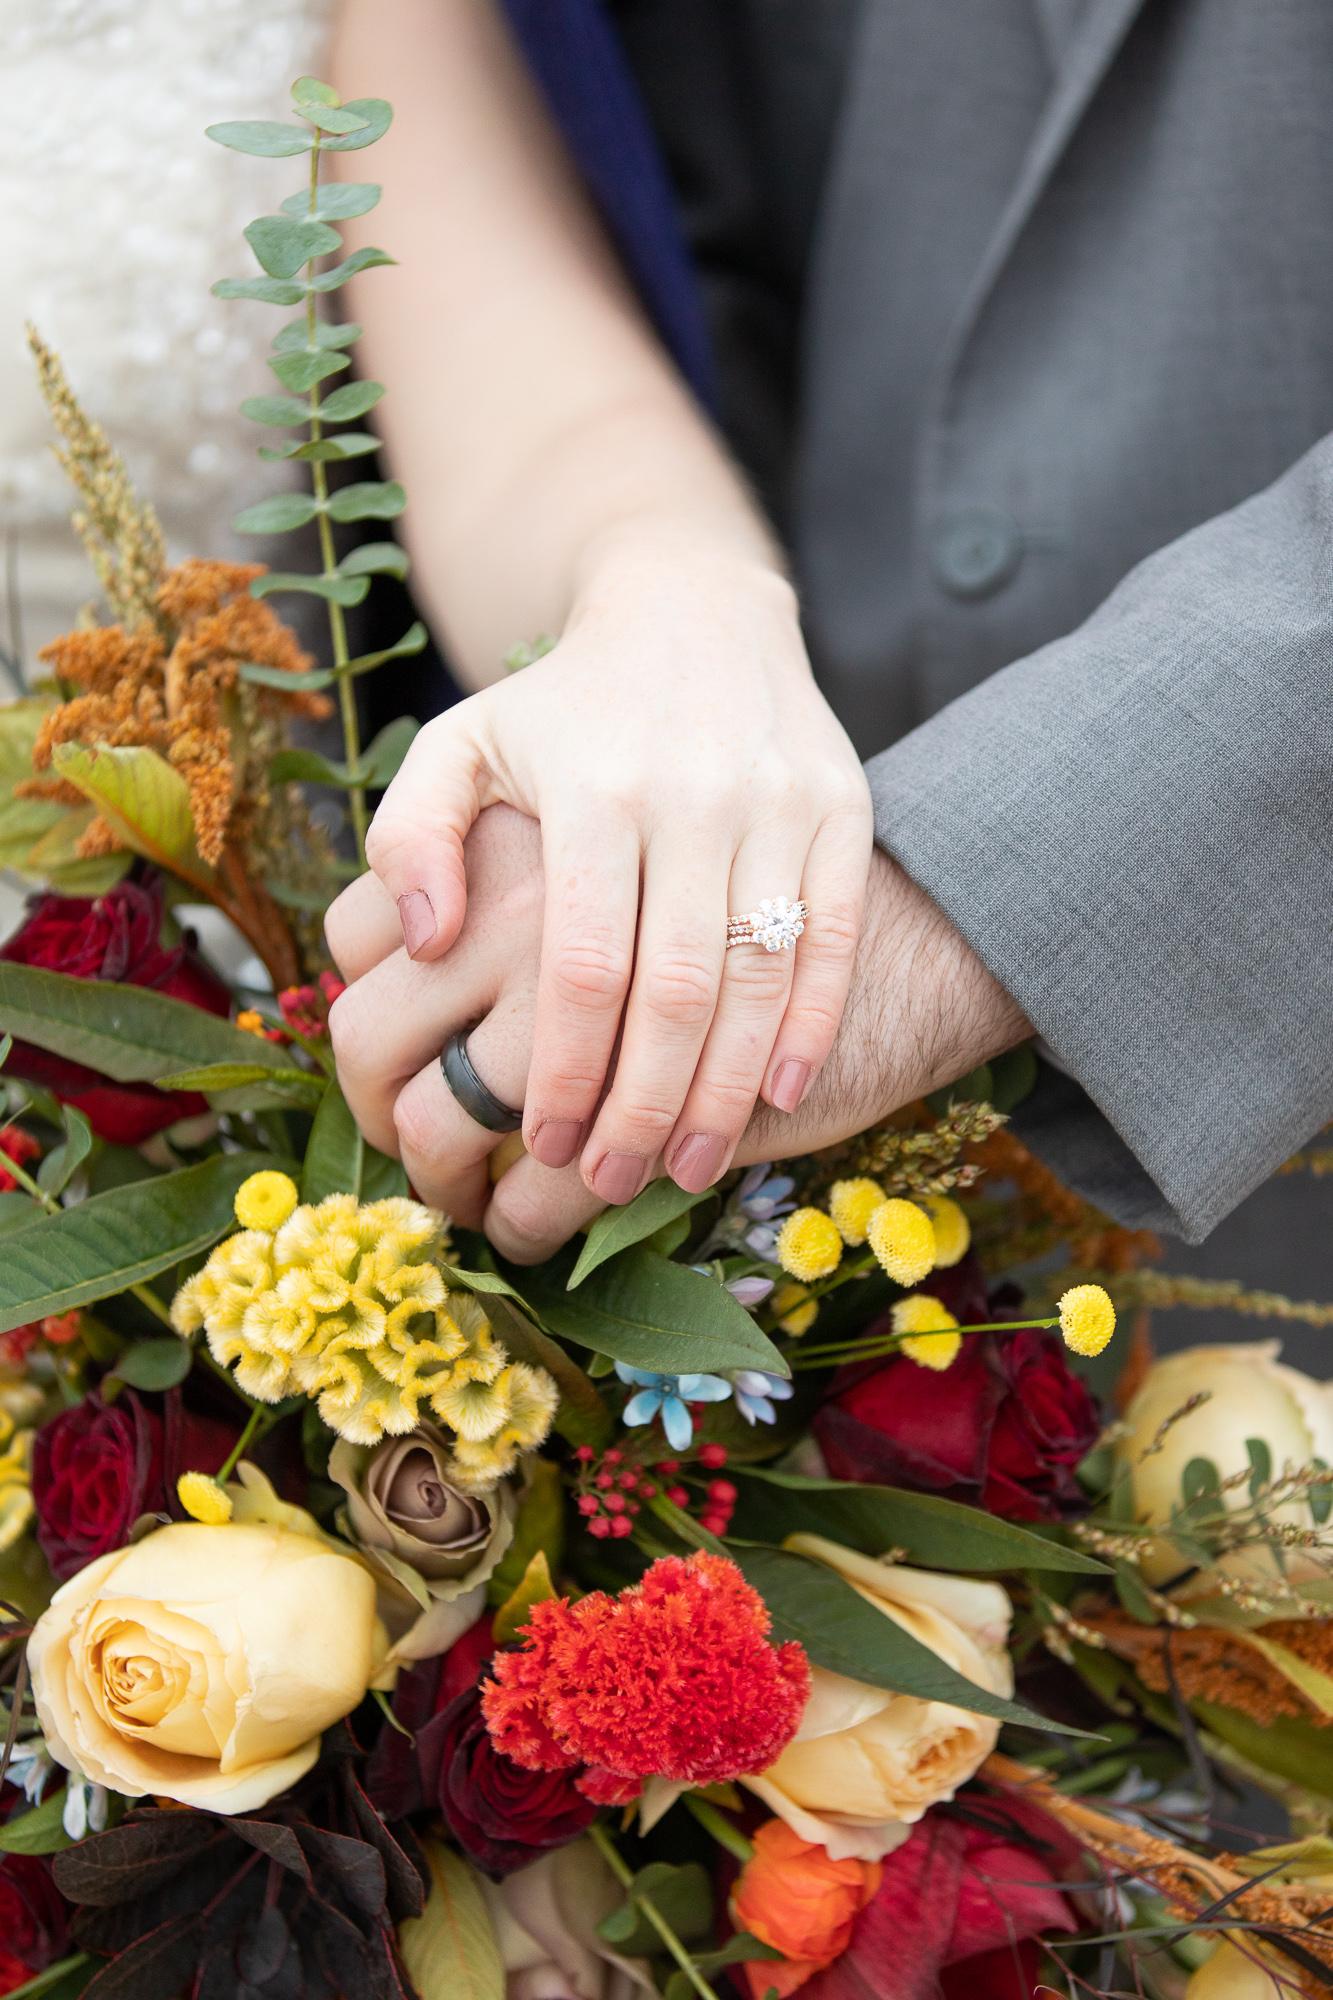 Bride and groom wearing Kimpel's Jewelers wedding rings on Posies by Pattie bridal bouquet.